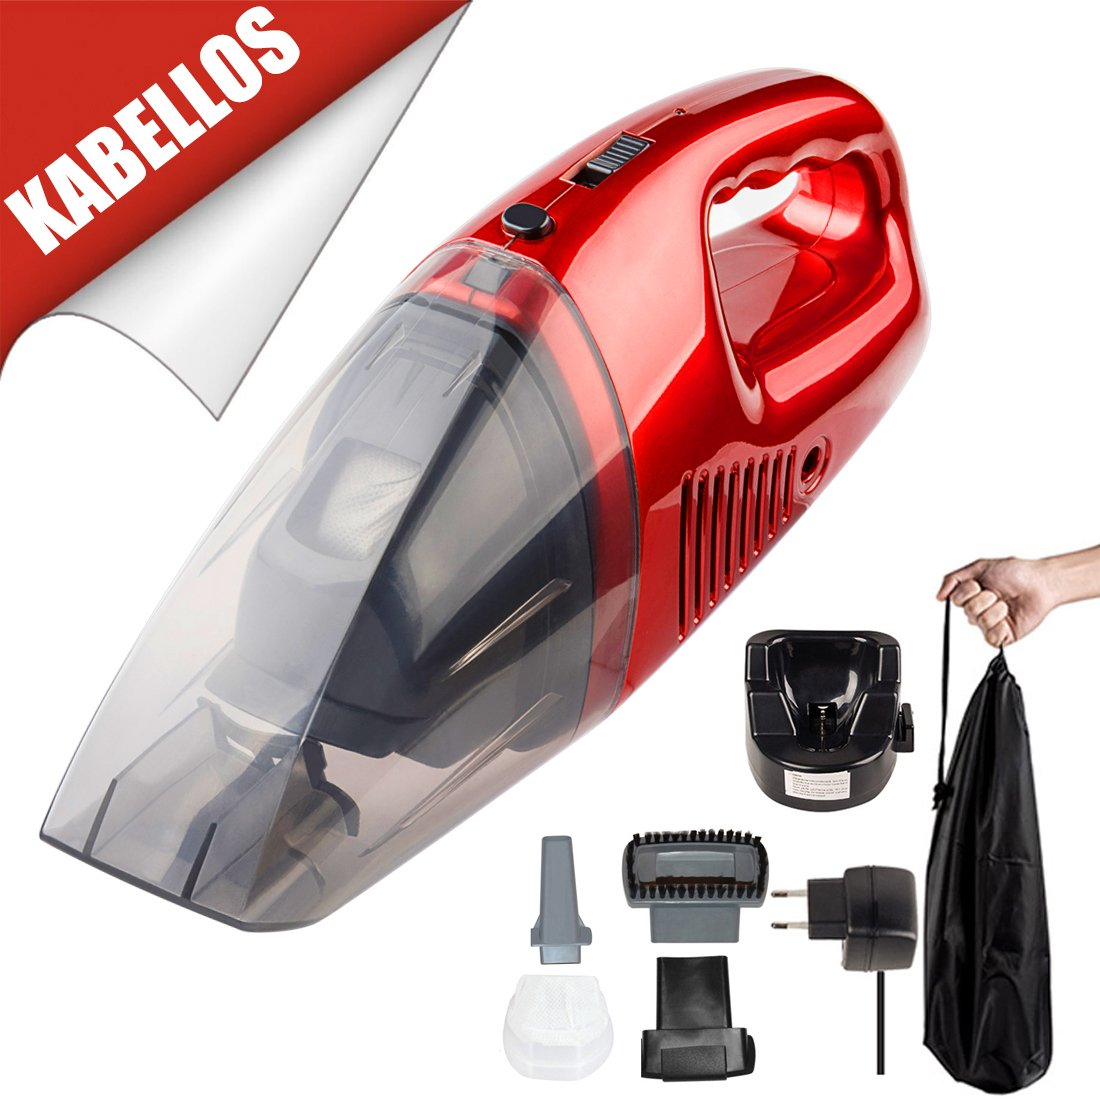 Aspiradora de mano 220 V 60 W handheld recargable Aspirador Auto ...